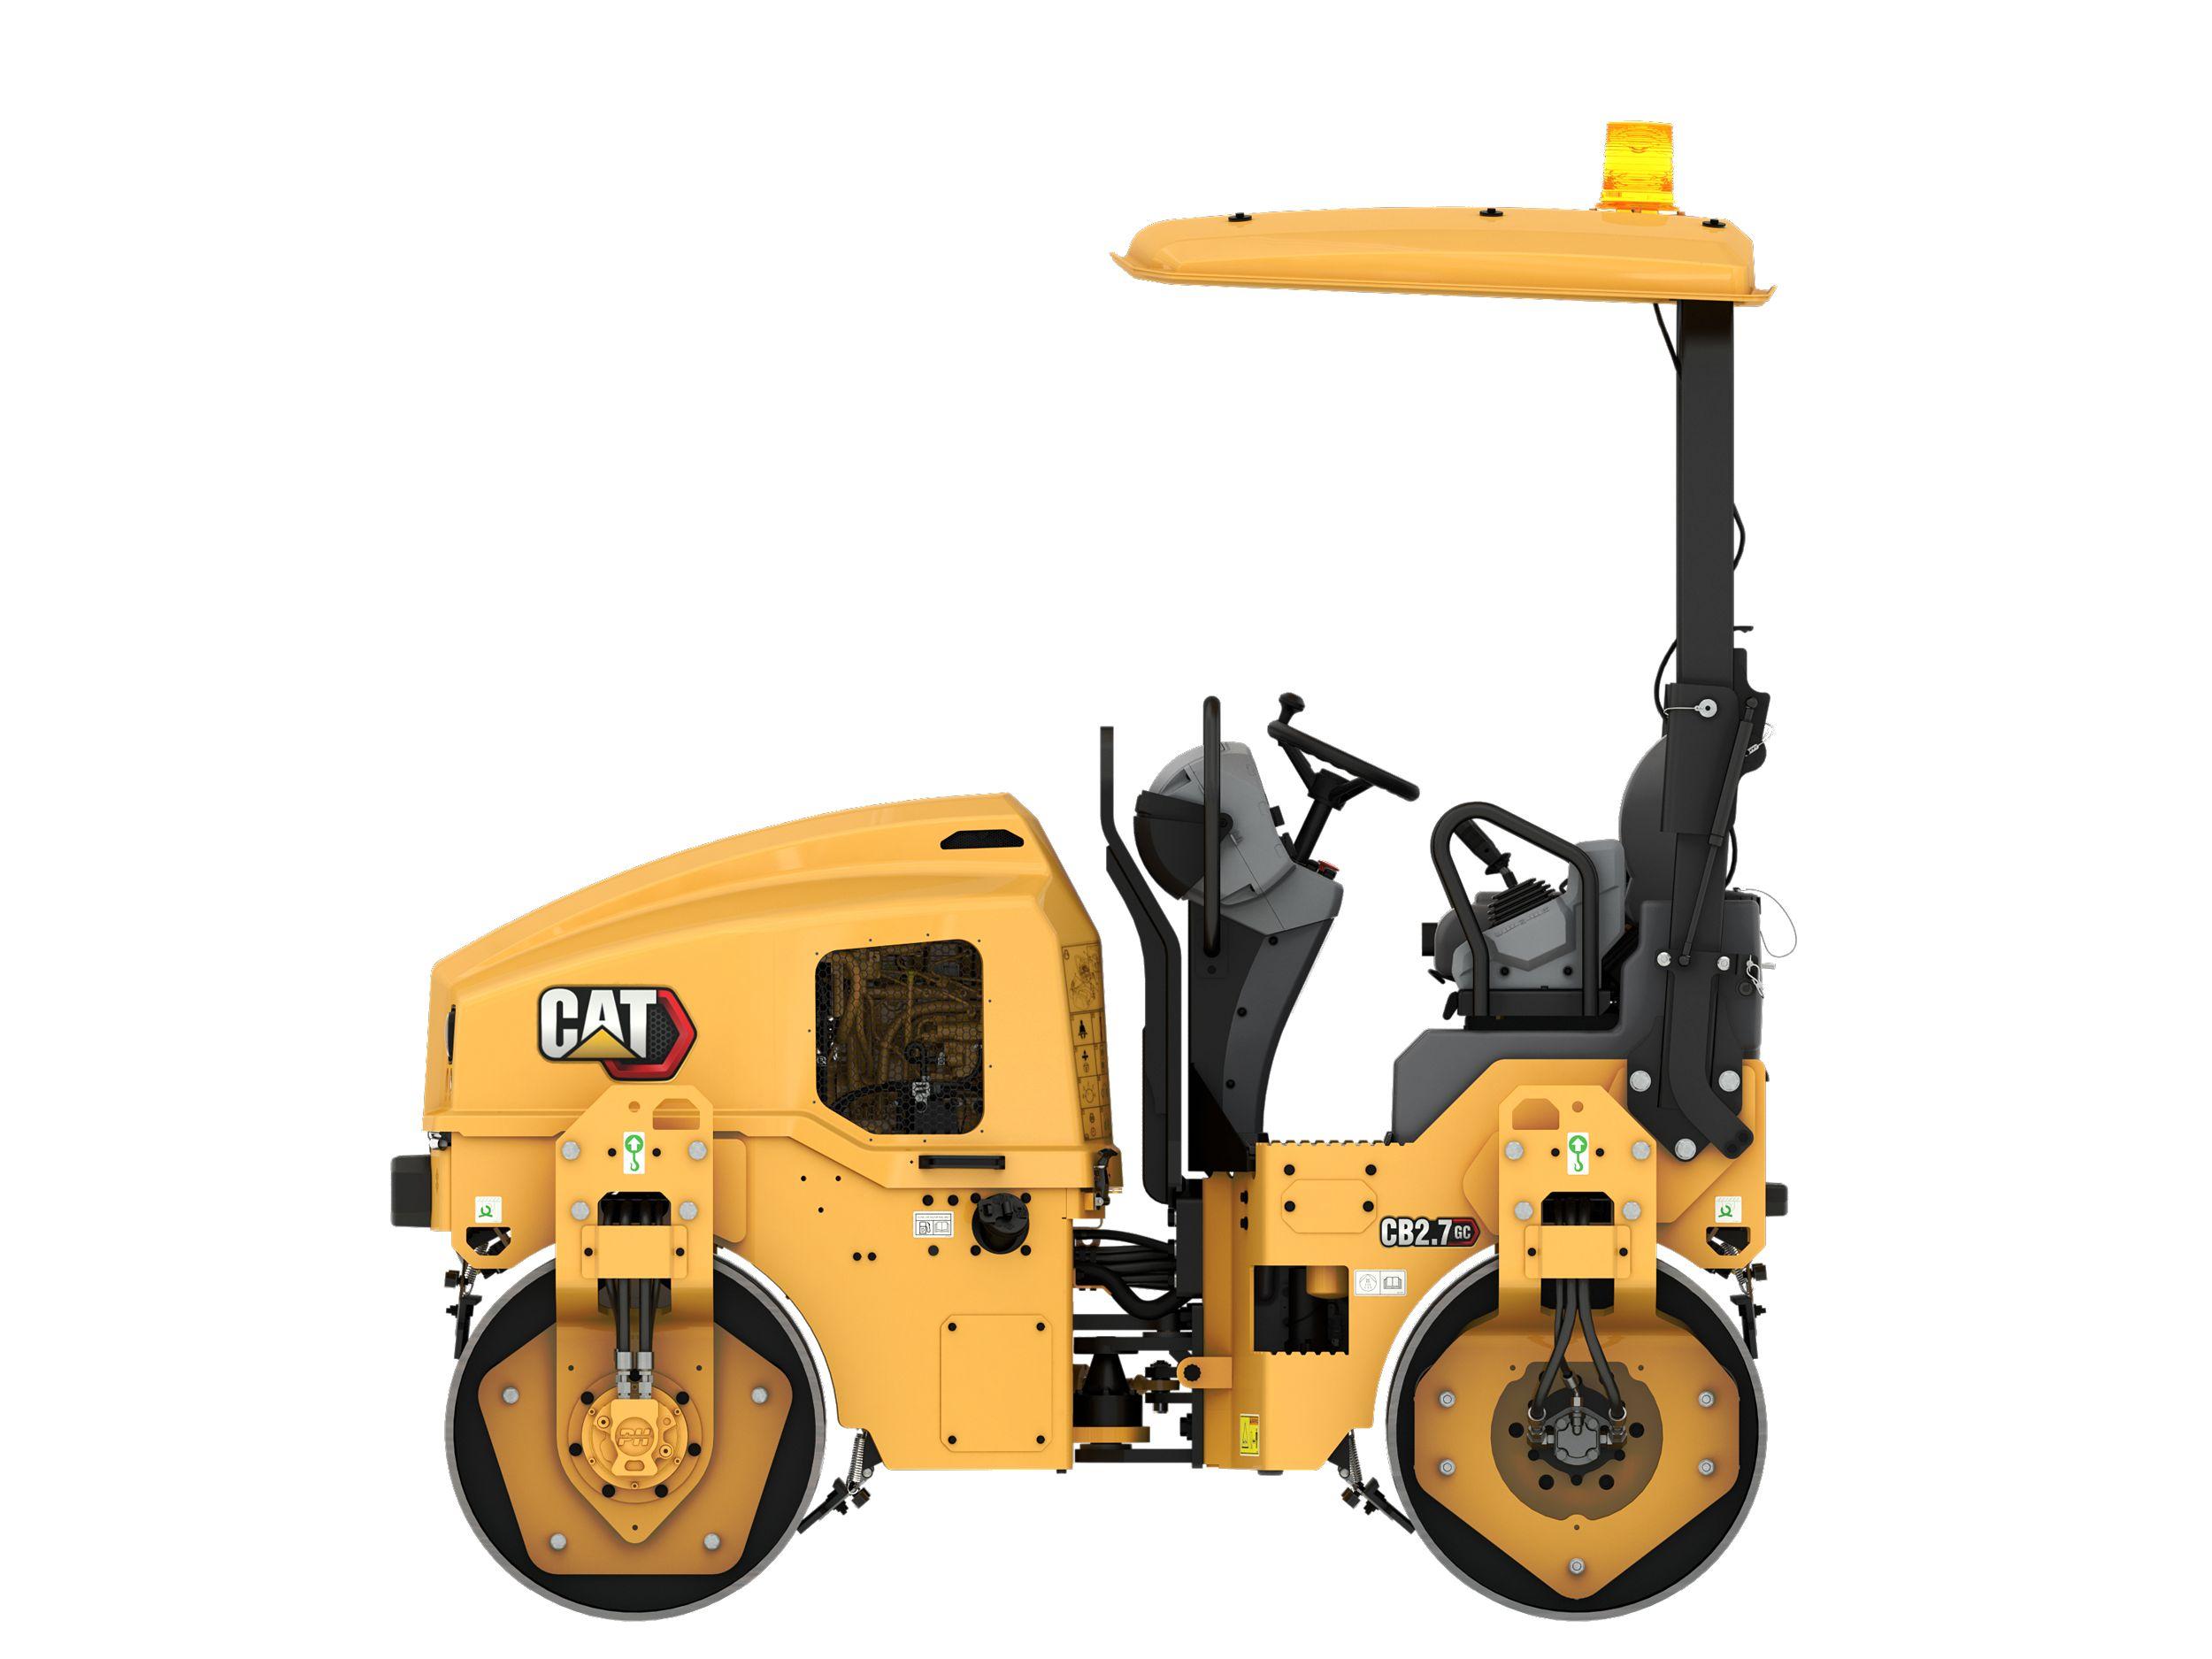 CB2.7 Utility Compactors